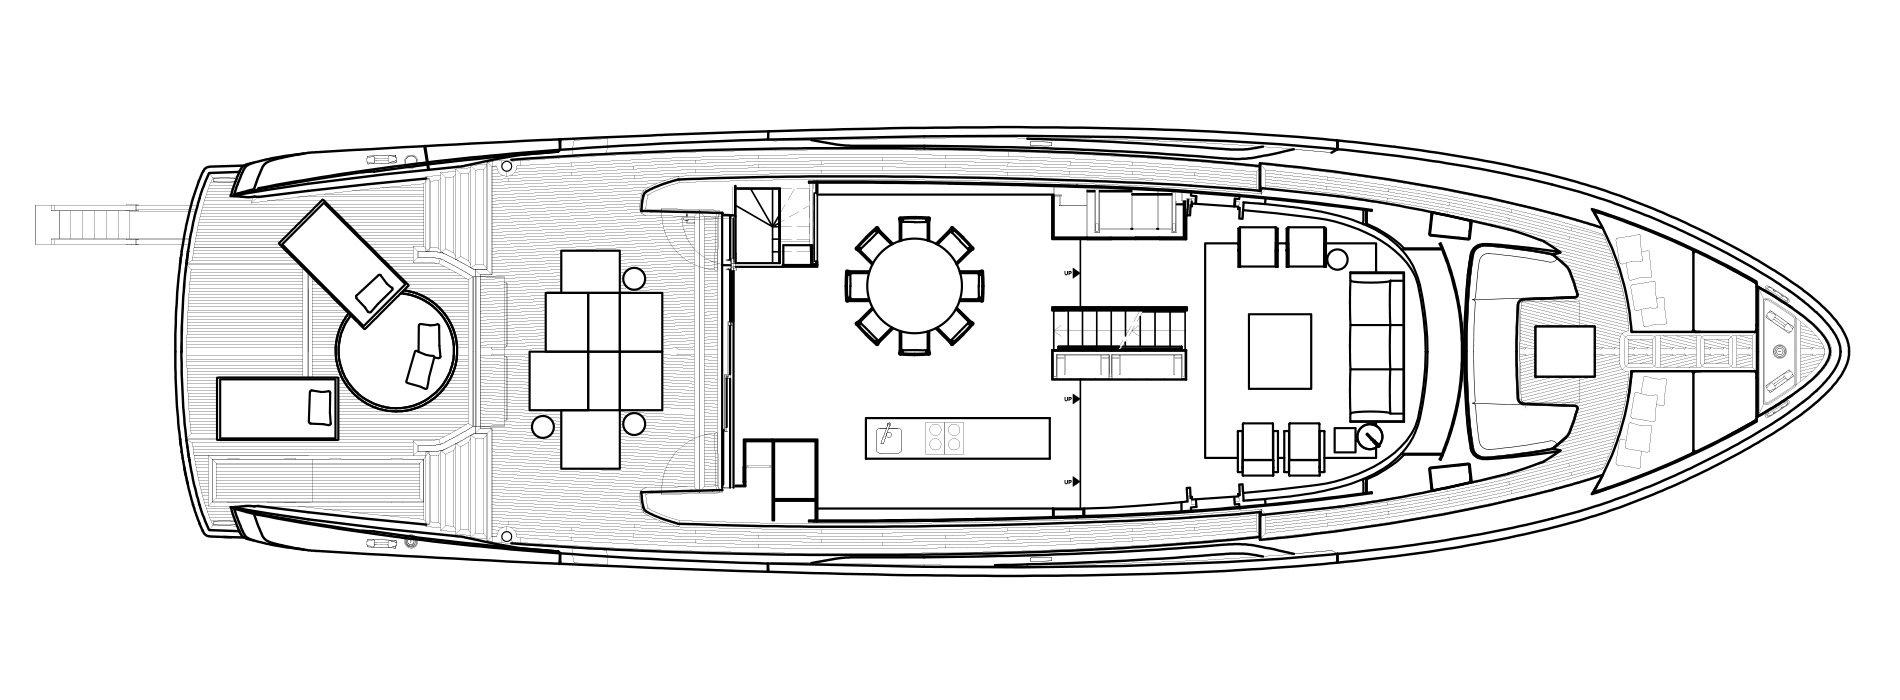 Sanlorenzo Yachts SX88 Hauptdeck Versione Lissoni